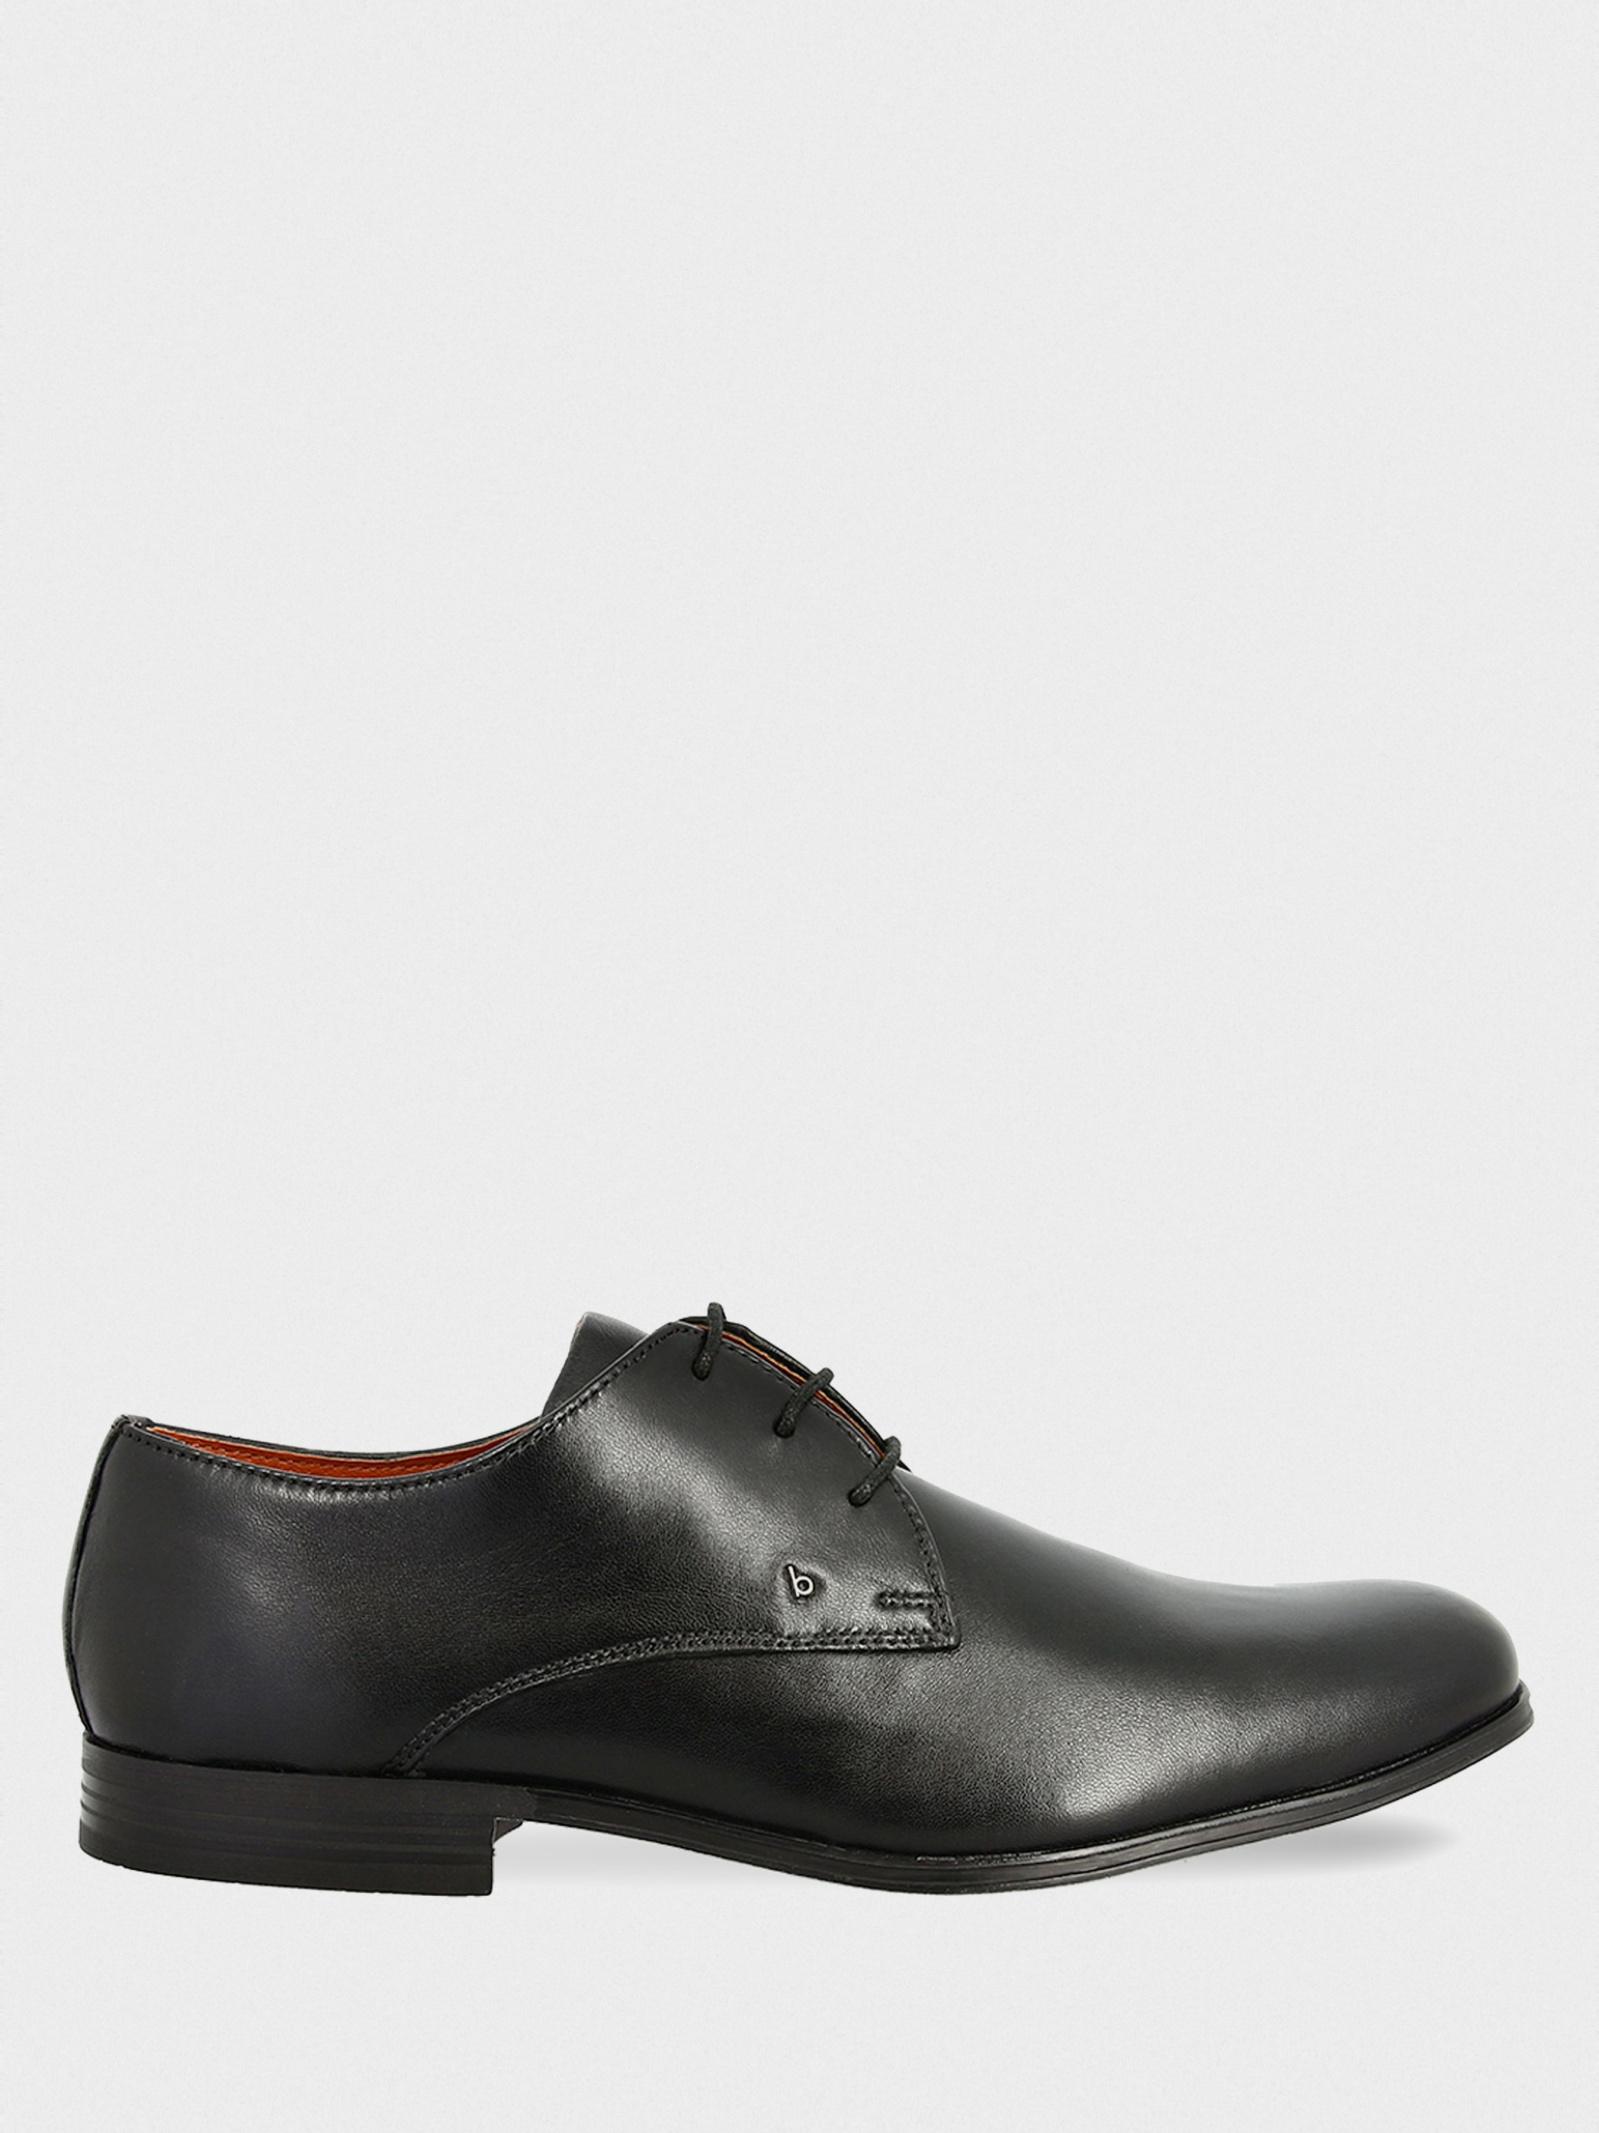 Туфли для мужчин Bugatti Lace-up shoes 311-90203-4000-1010 продажа, 2017